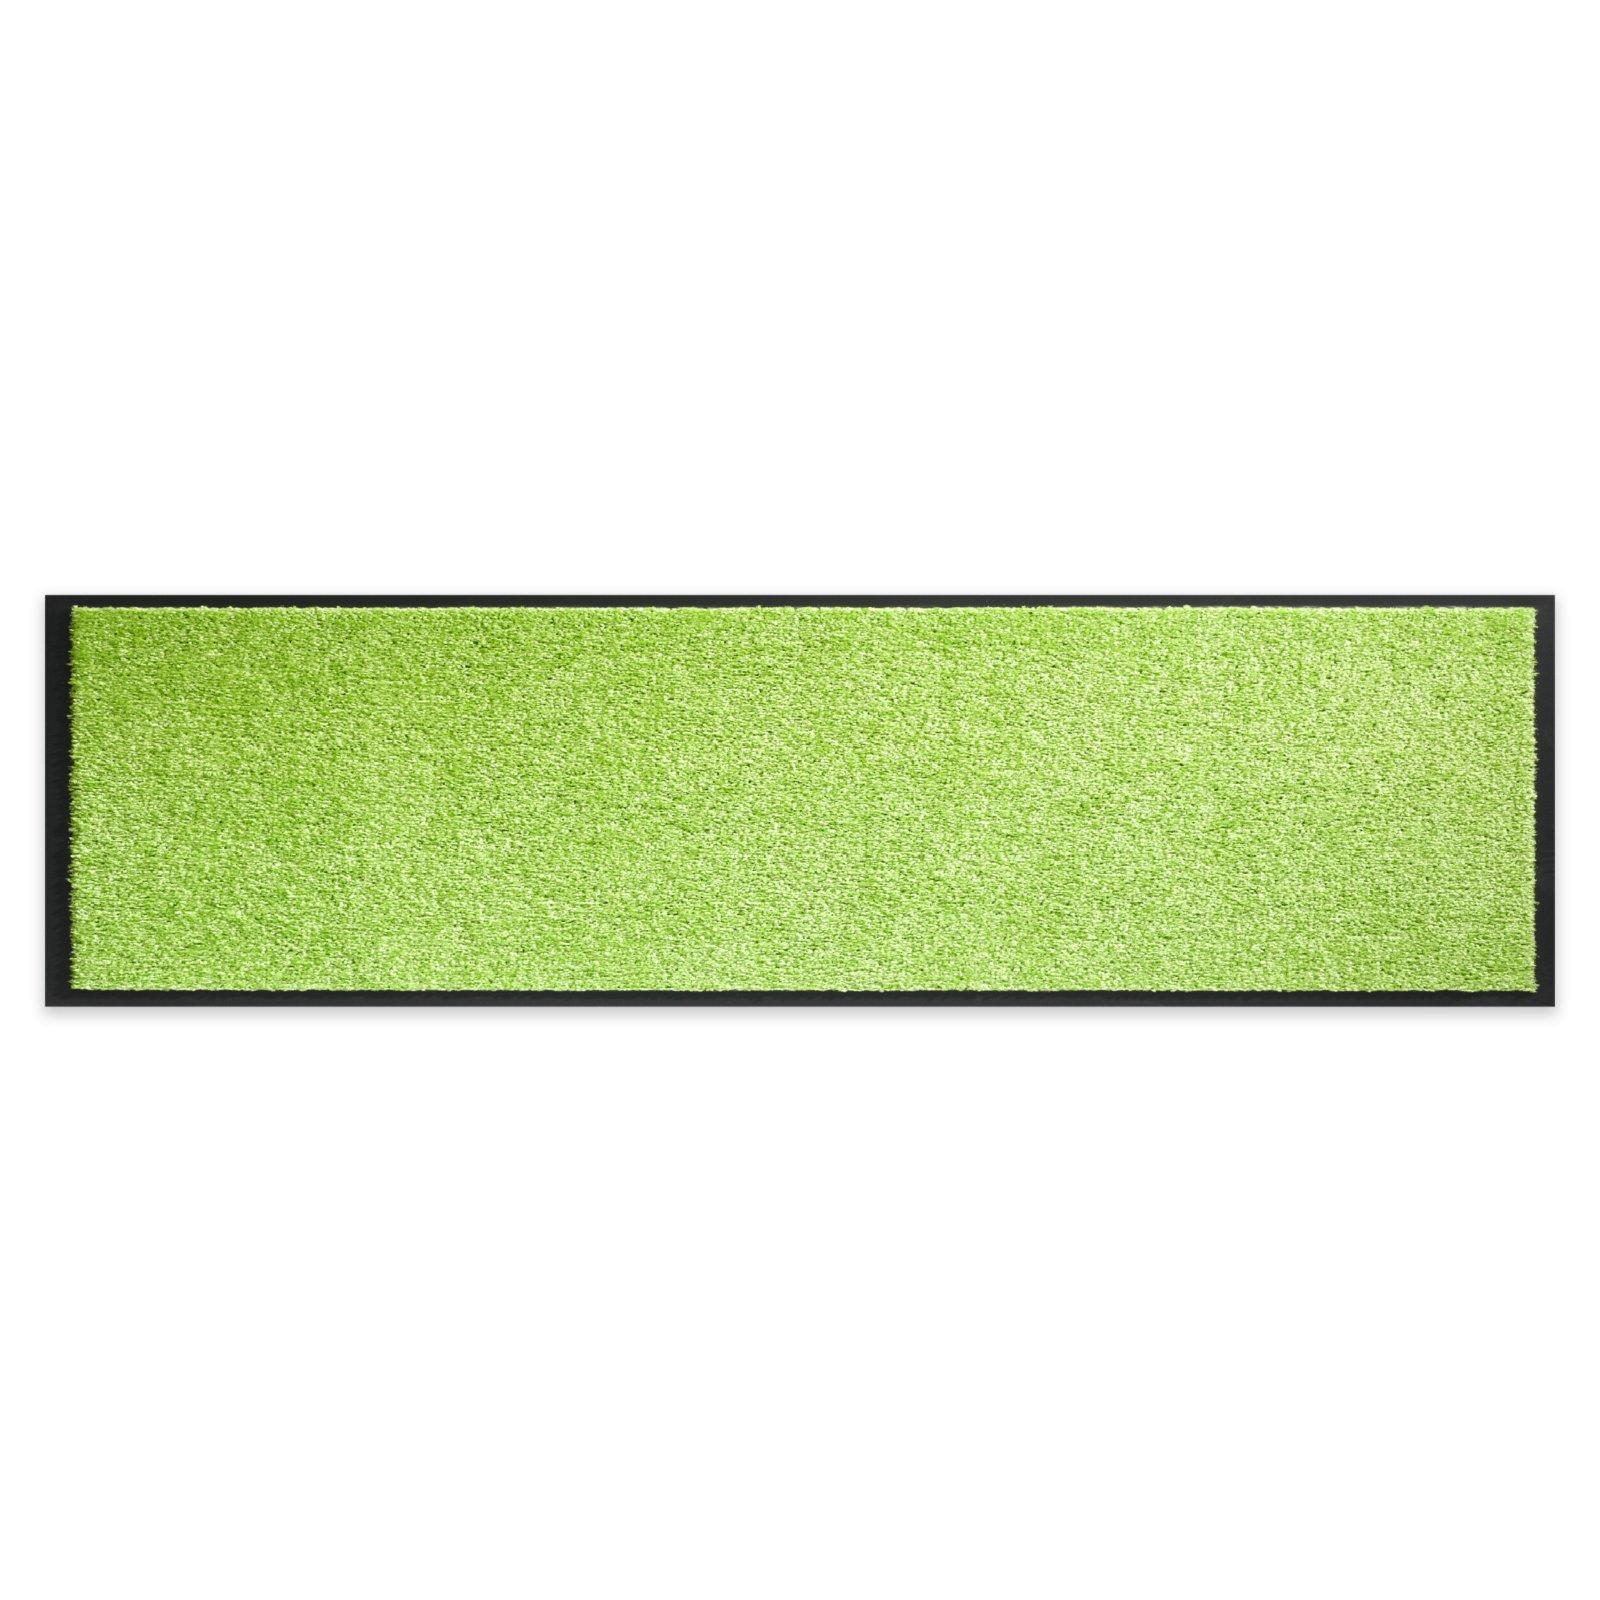 Fußmatte TWISTER - lime - 180x60 cm